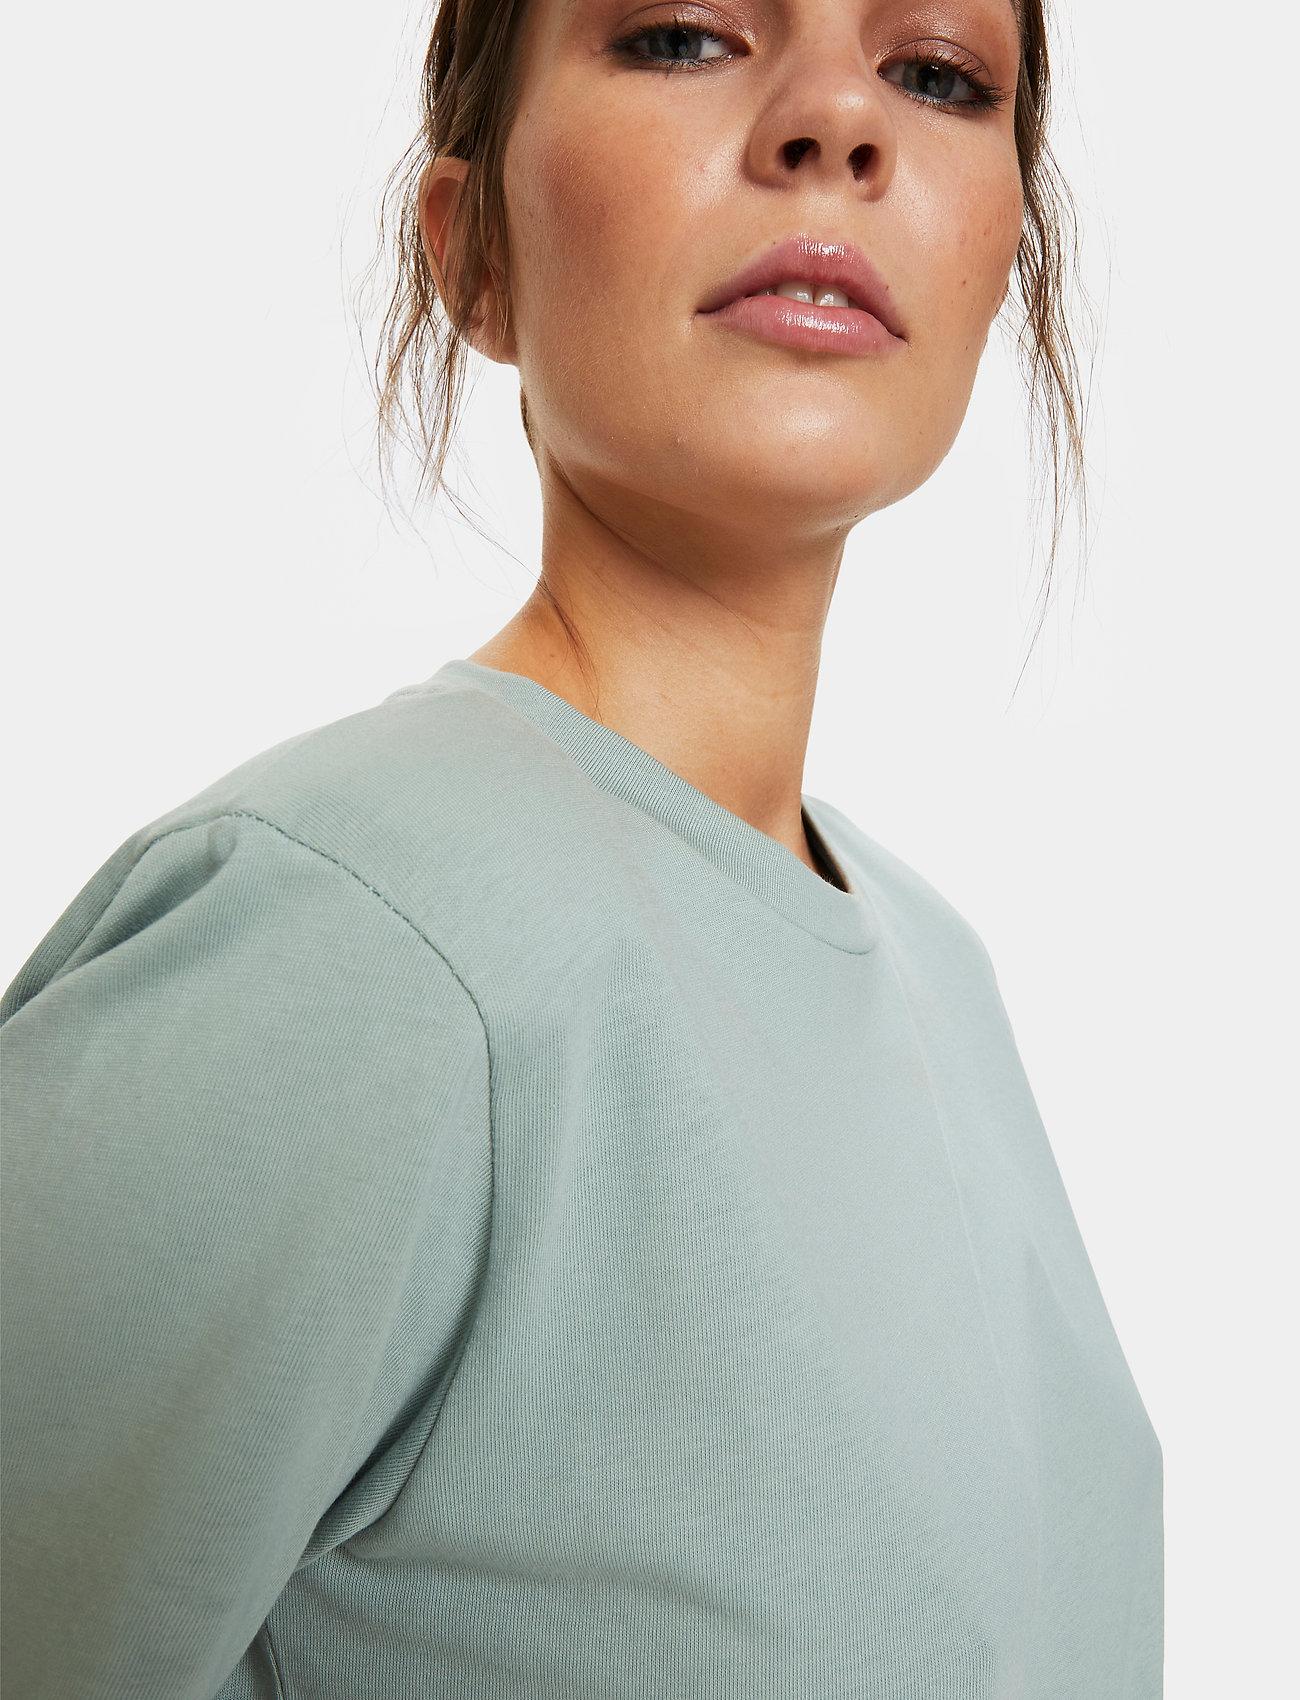 Gestuz - JoryGZ tee - t-shirts - slate gray - 0